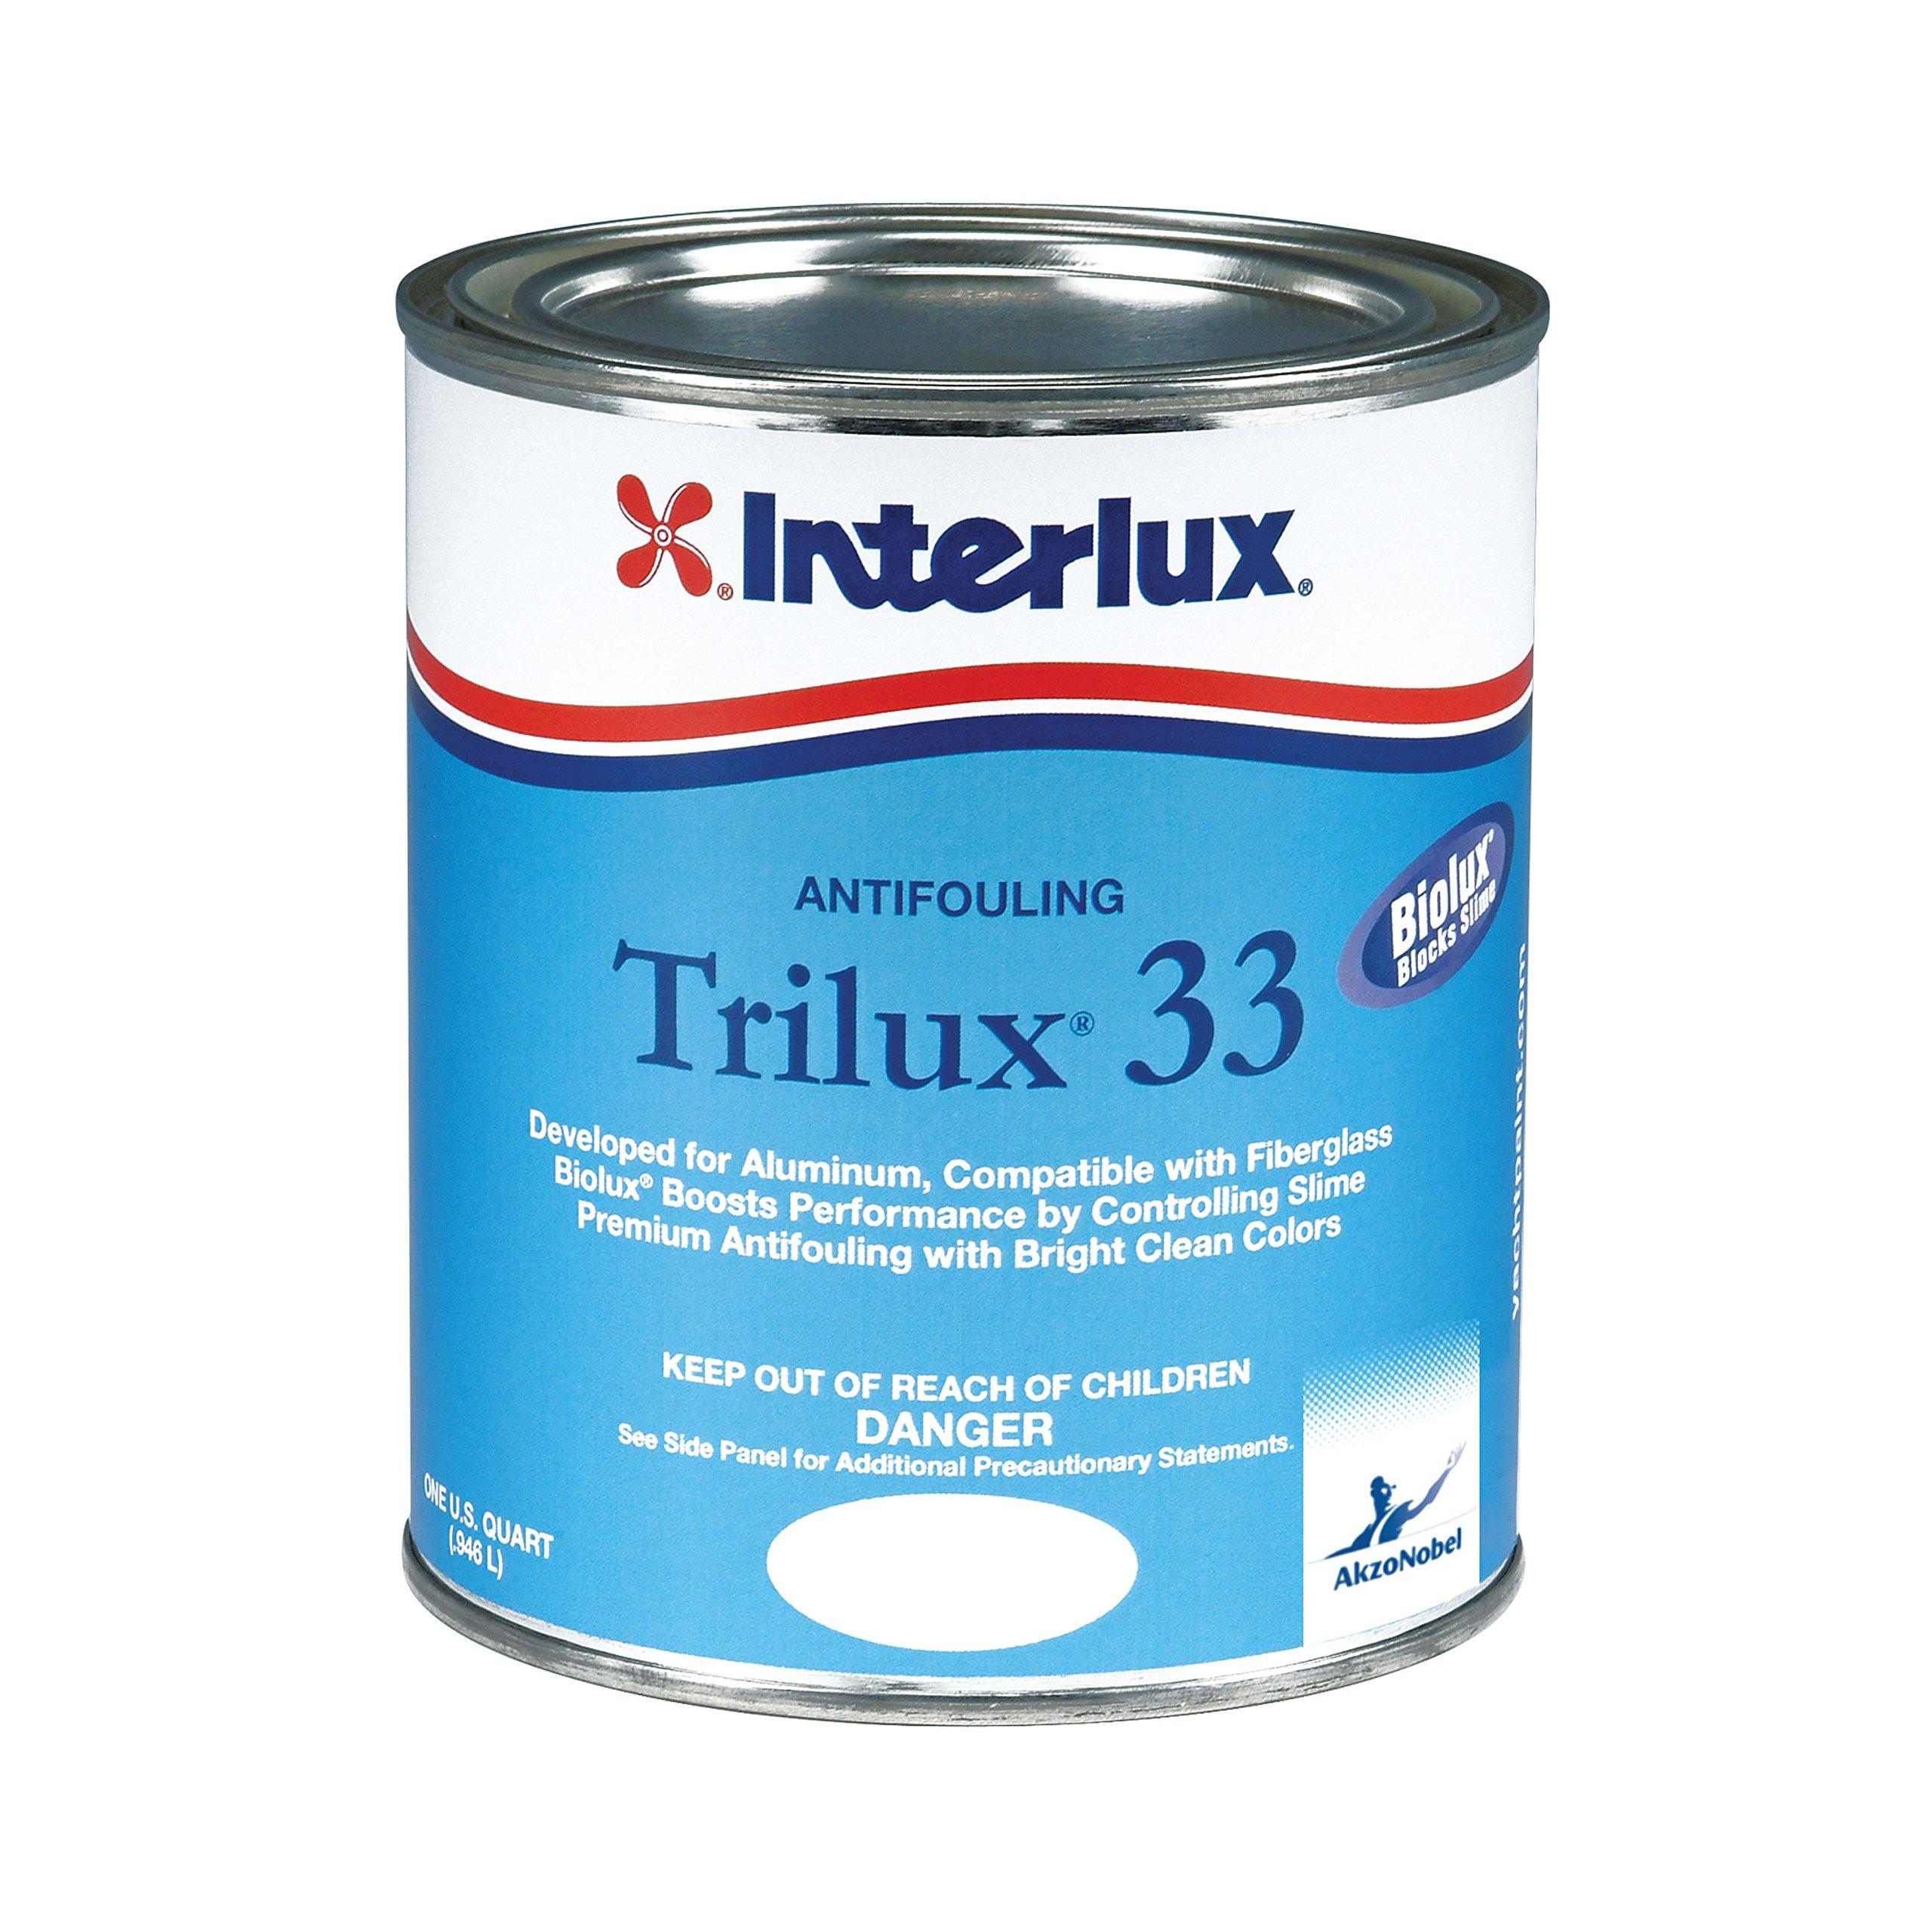 Interlux YBA068 QT Antifouling Fluid_Ounces